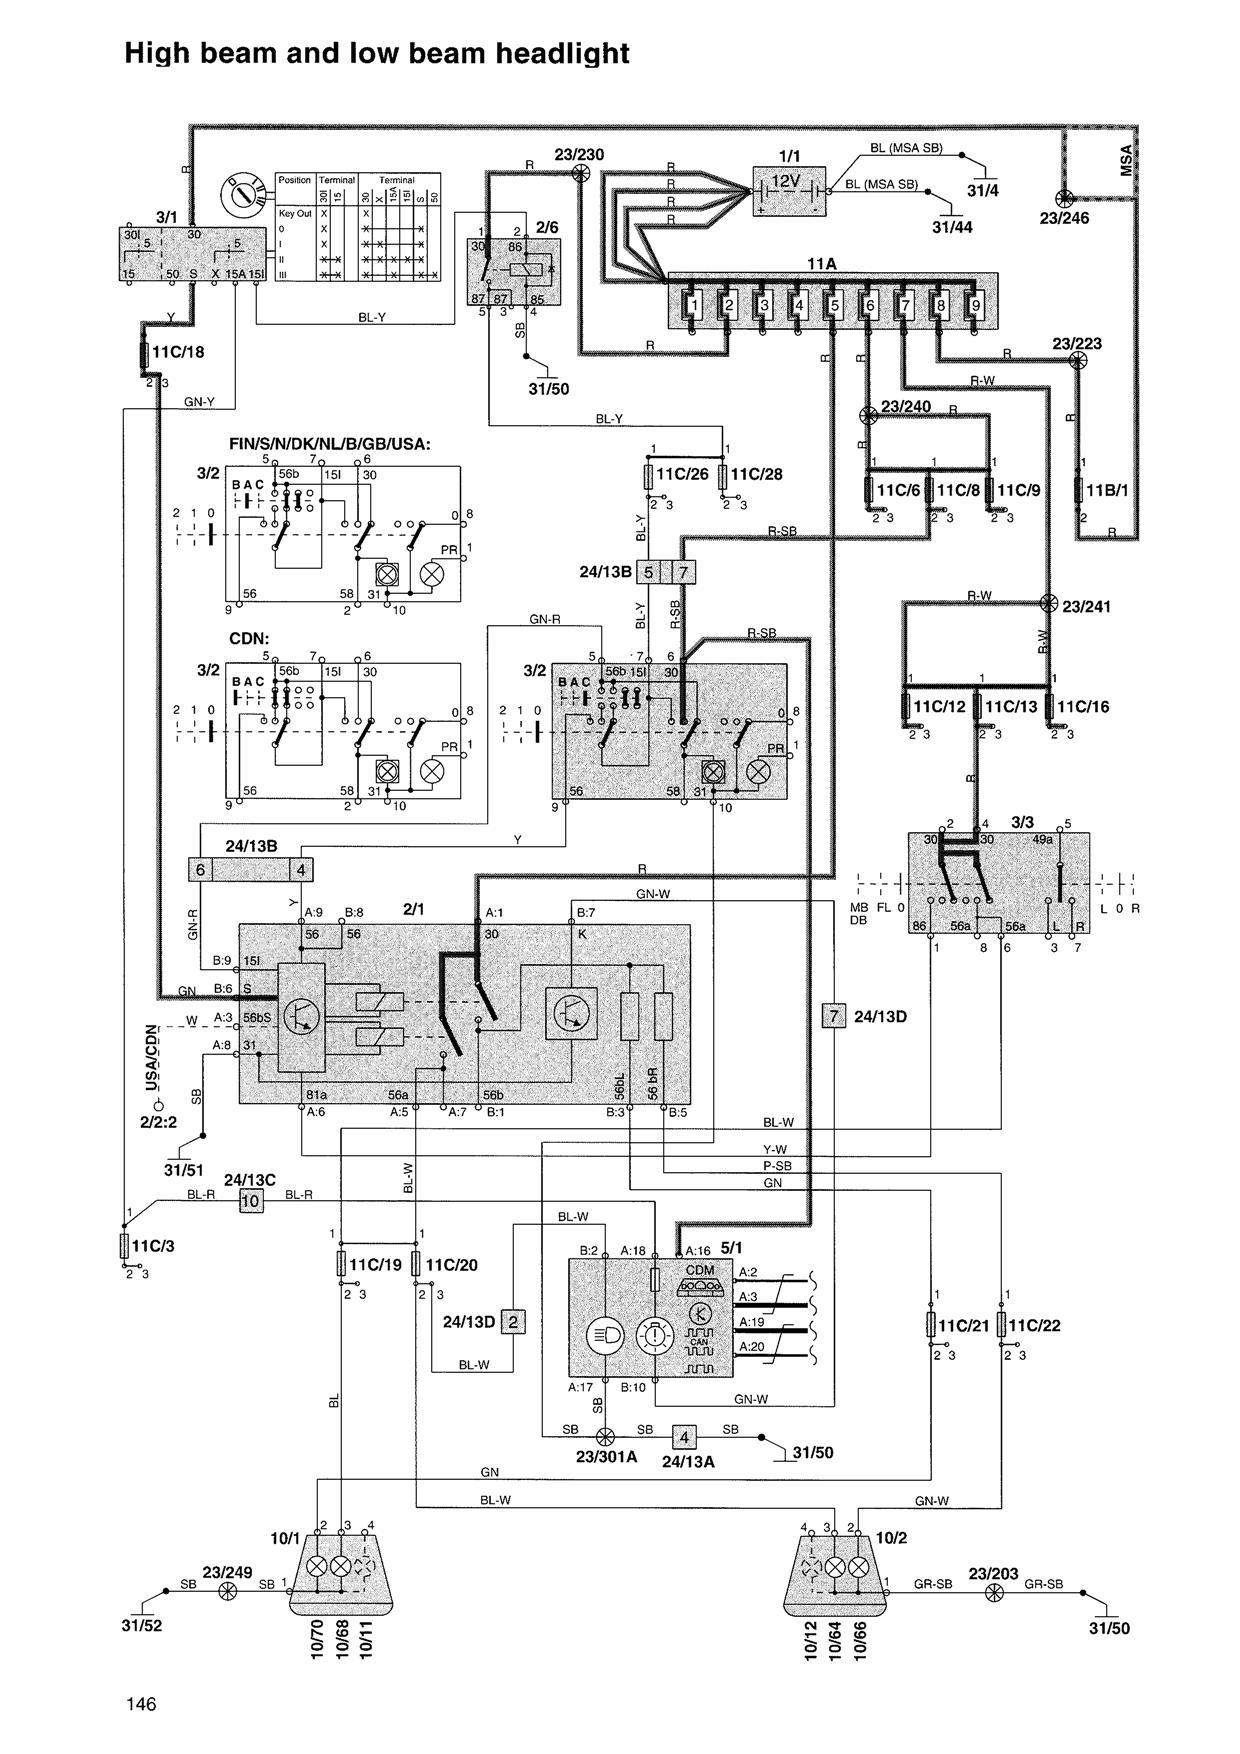 volvo xc70 wiring diagram volvo image wiring diagram volvo wiring diagrams volvo image wiring diagram on volvo xc70 wiring diagram